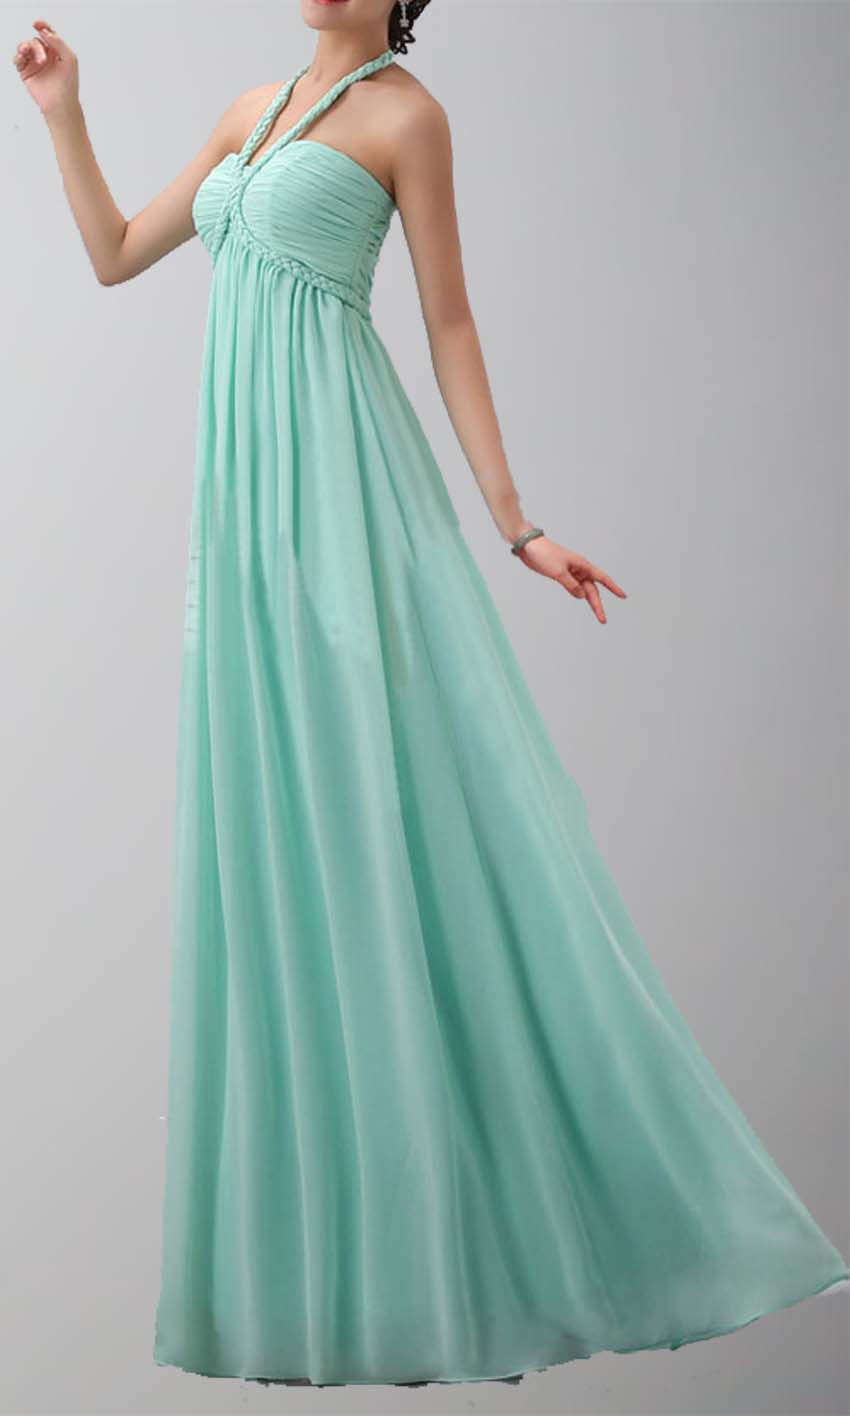 Teal Halter Neck Long Chiffon Prom Dress/Bridesmaid Dress KSP169 ...